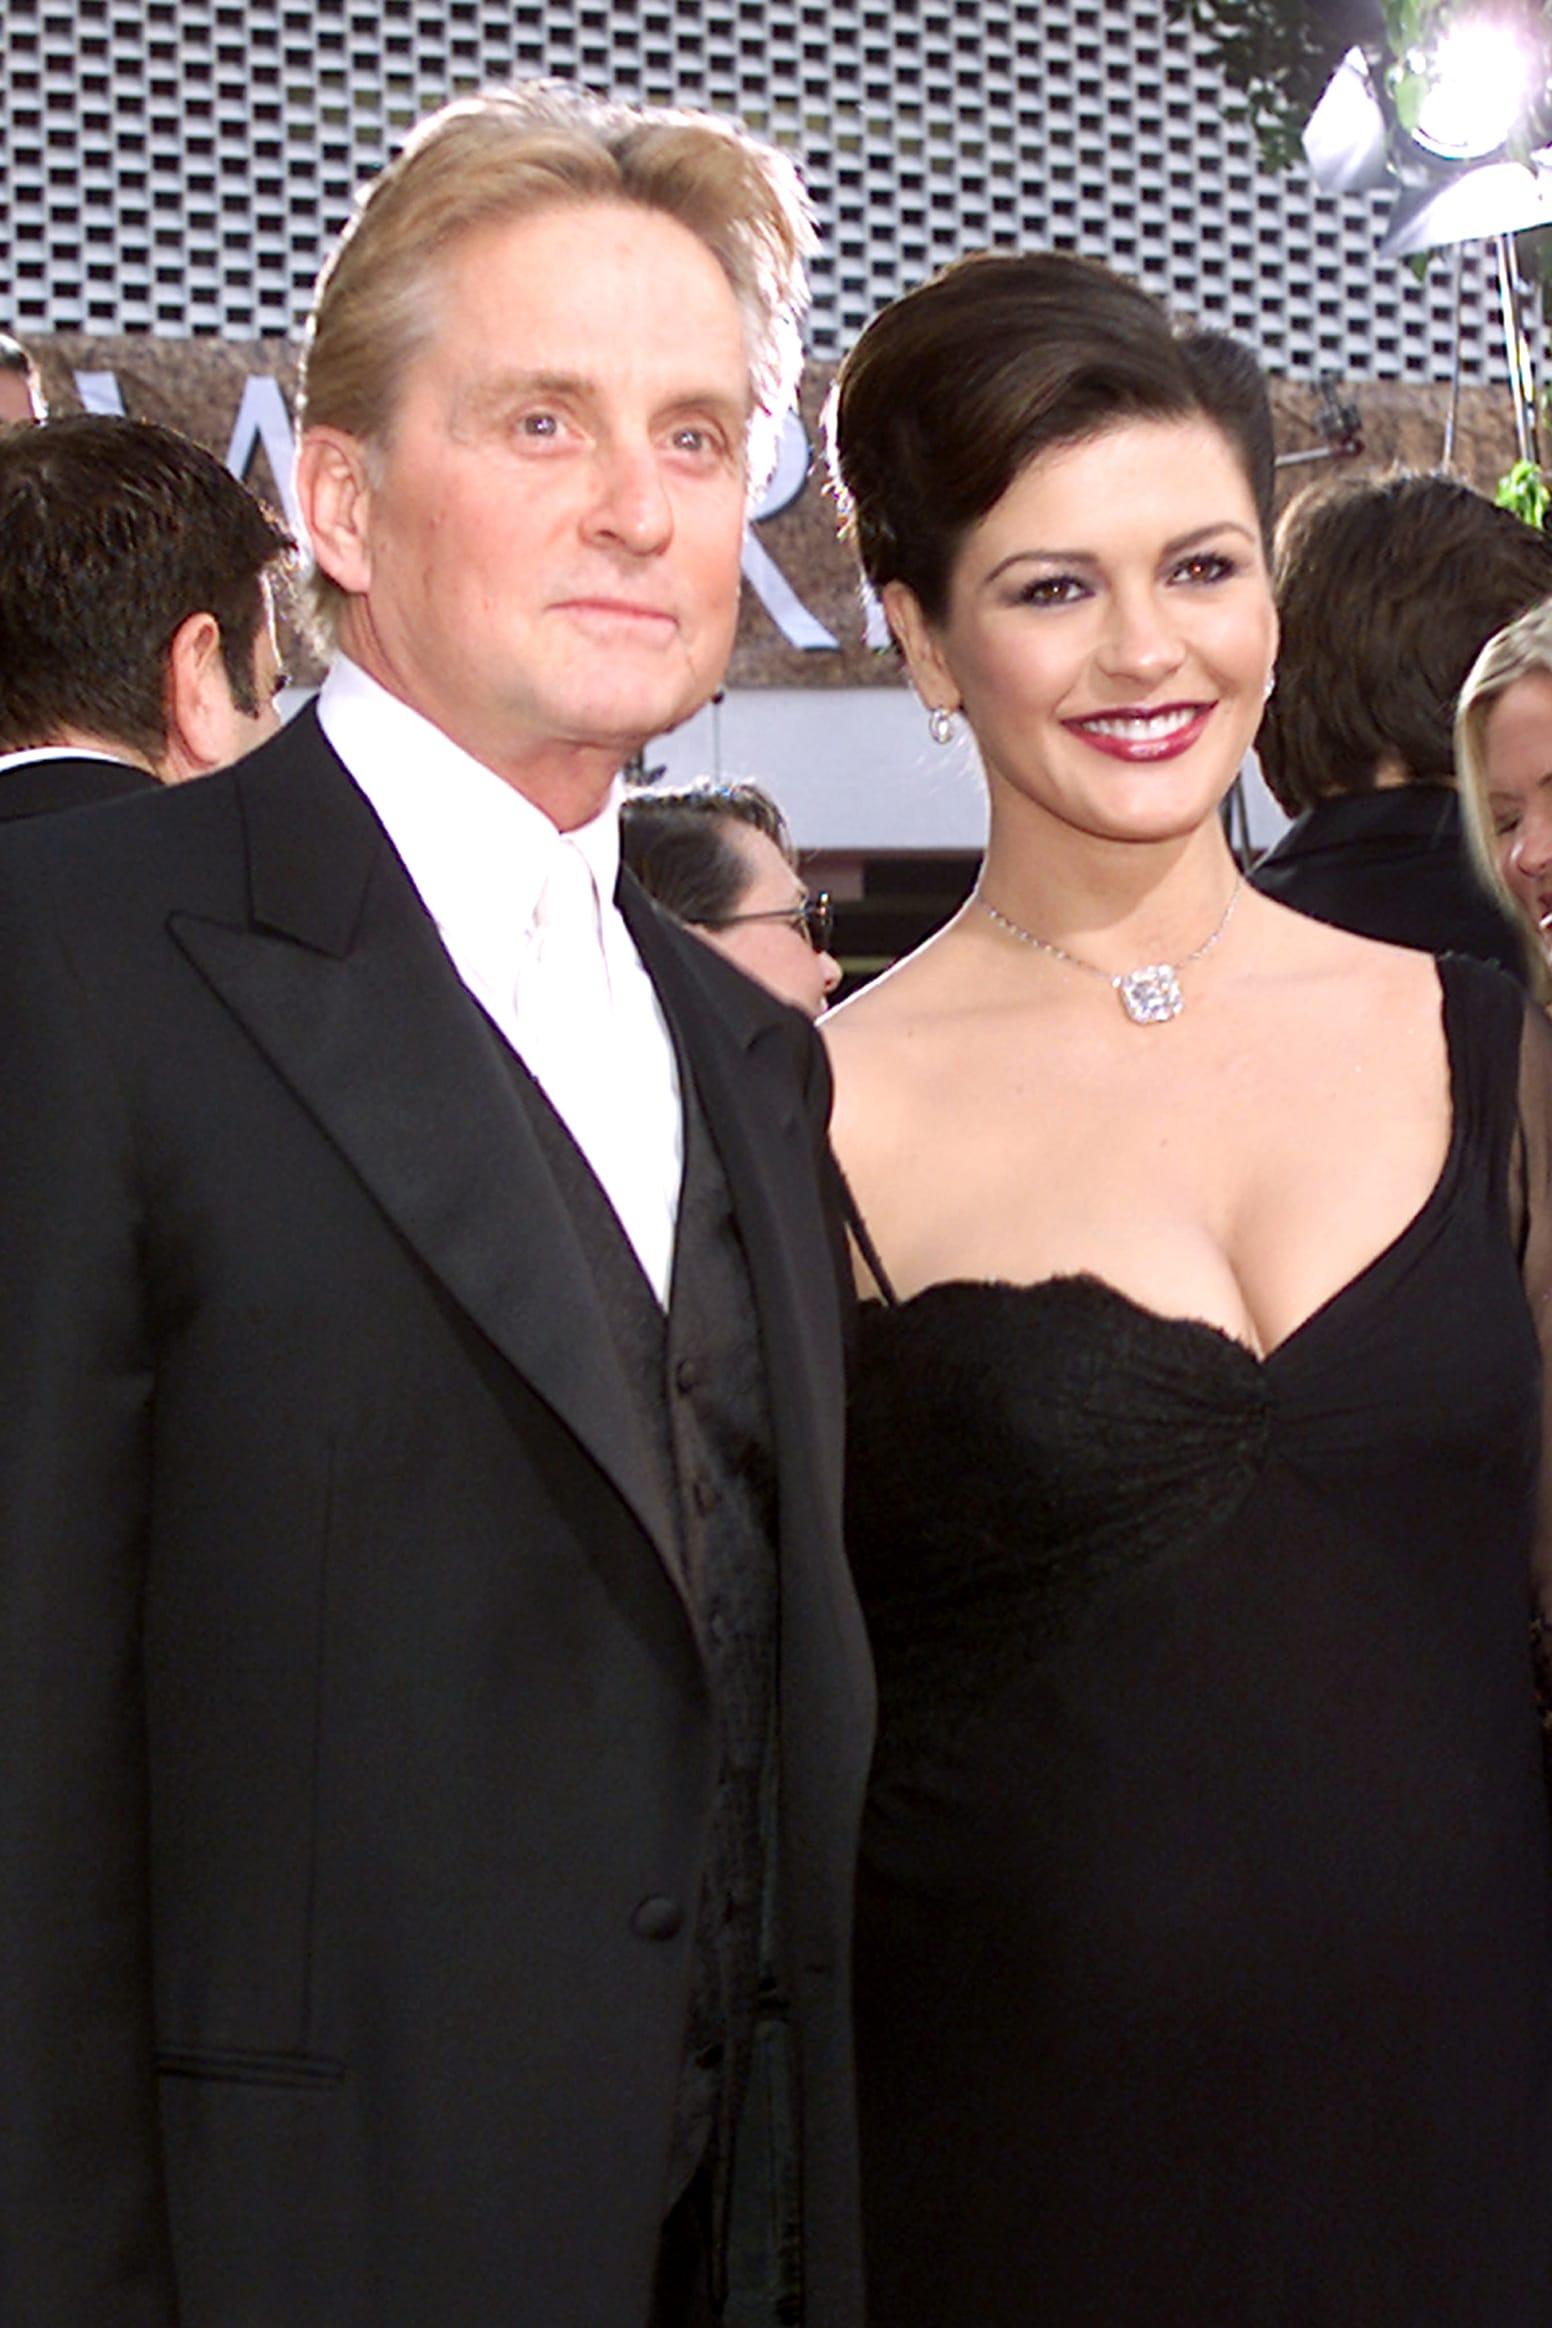 Michael Douglas and Catherine Zeta-Jones at Golden Globe Awards